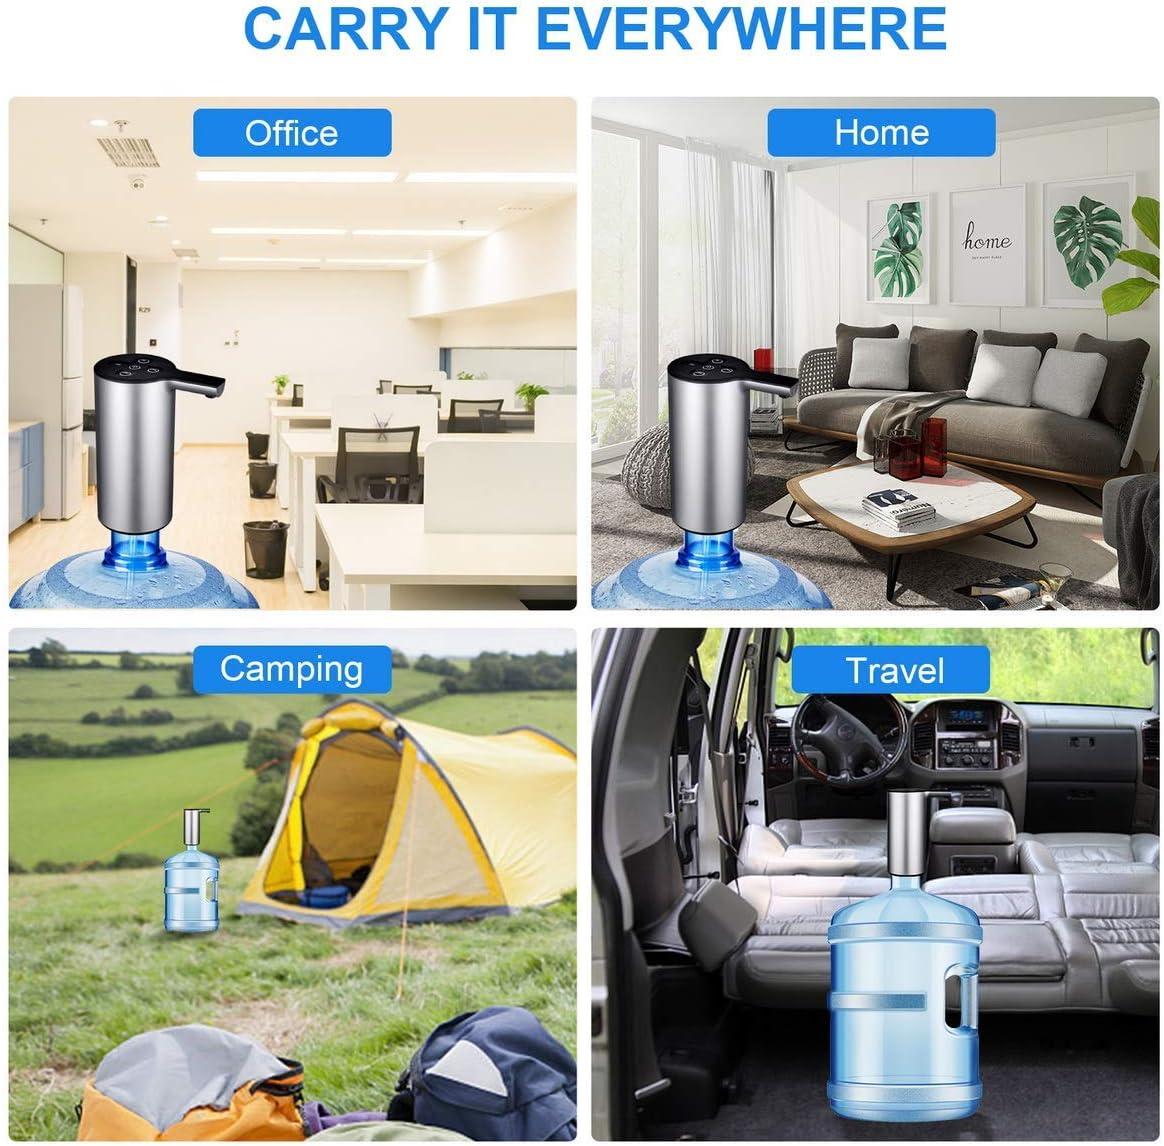 Auto Bottled Water Pump with Volume Control Wireless Water Dispenser Rechargeable Gallon Water Bottle Jug Dispenser Pump